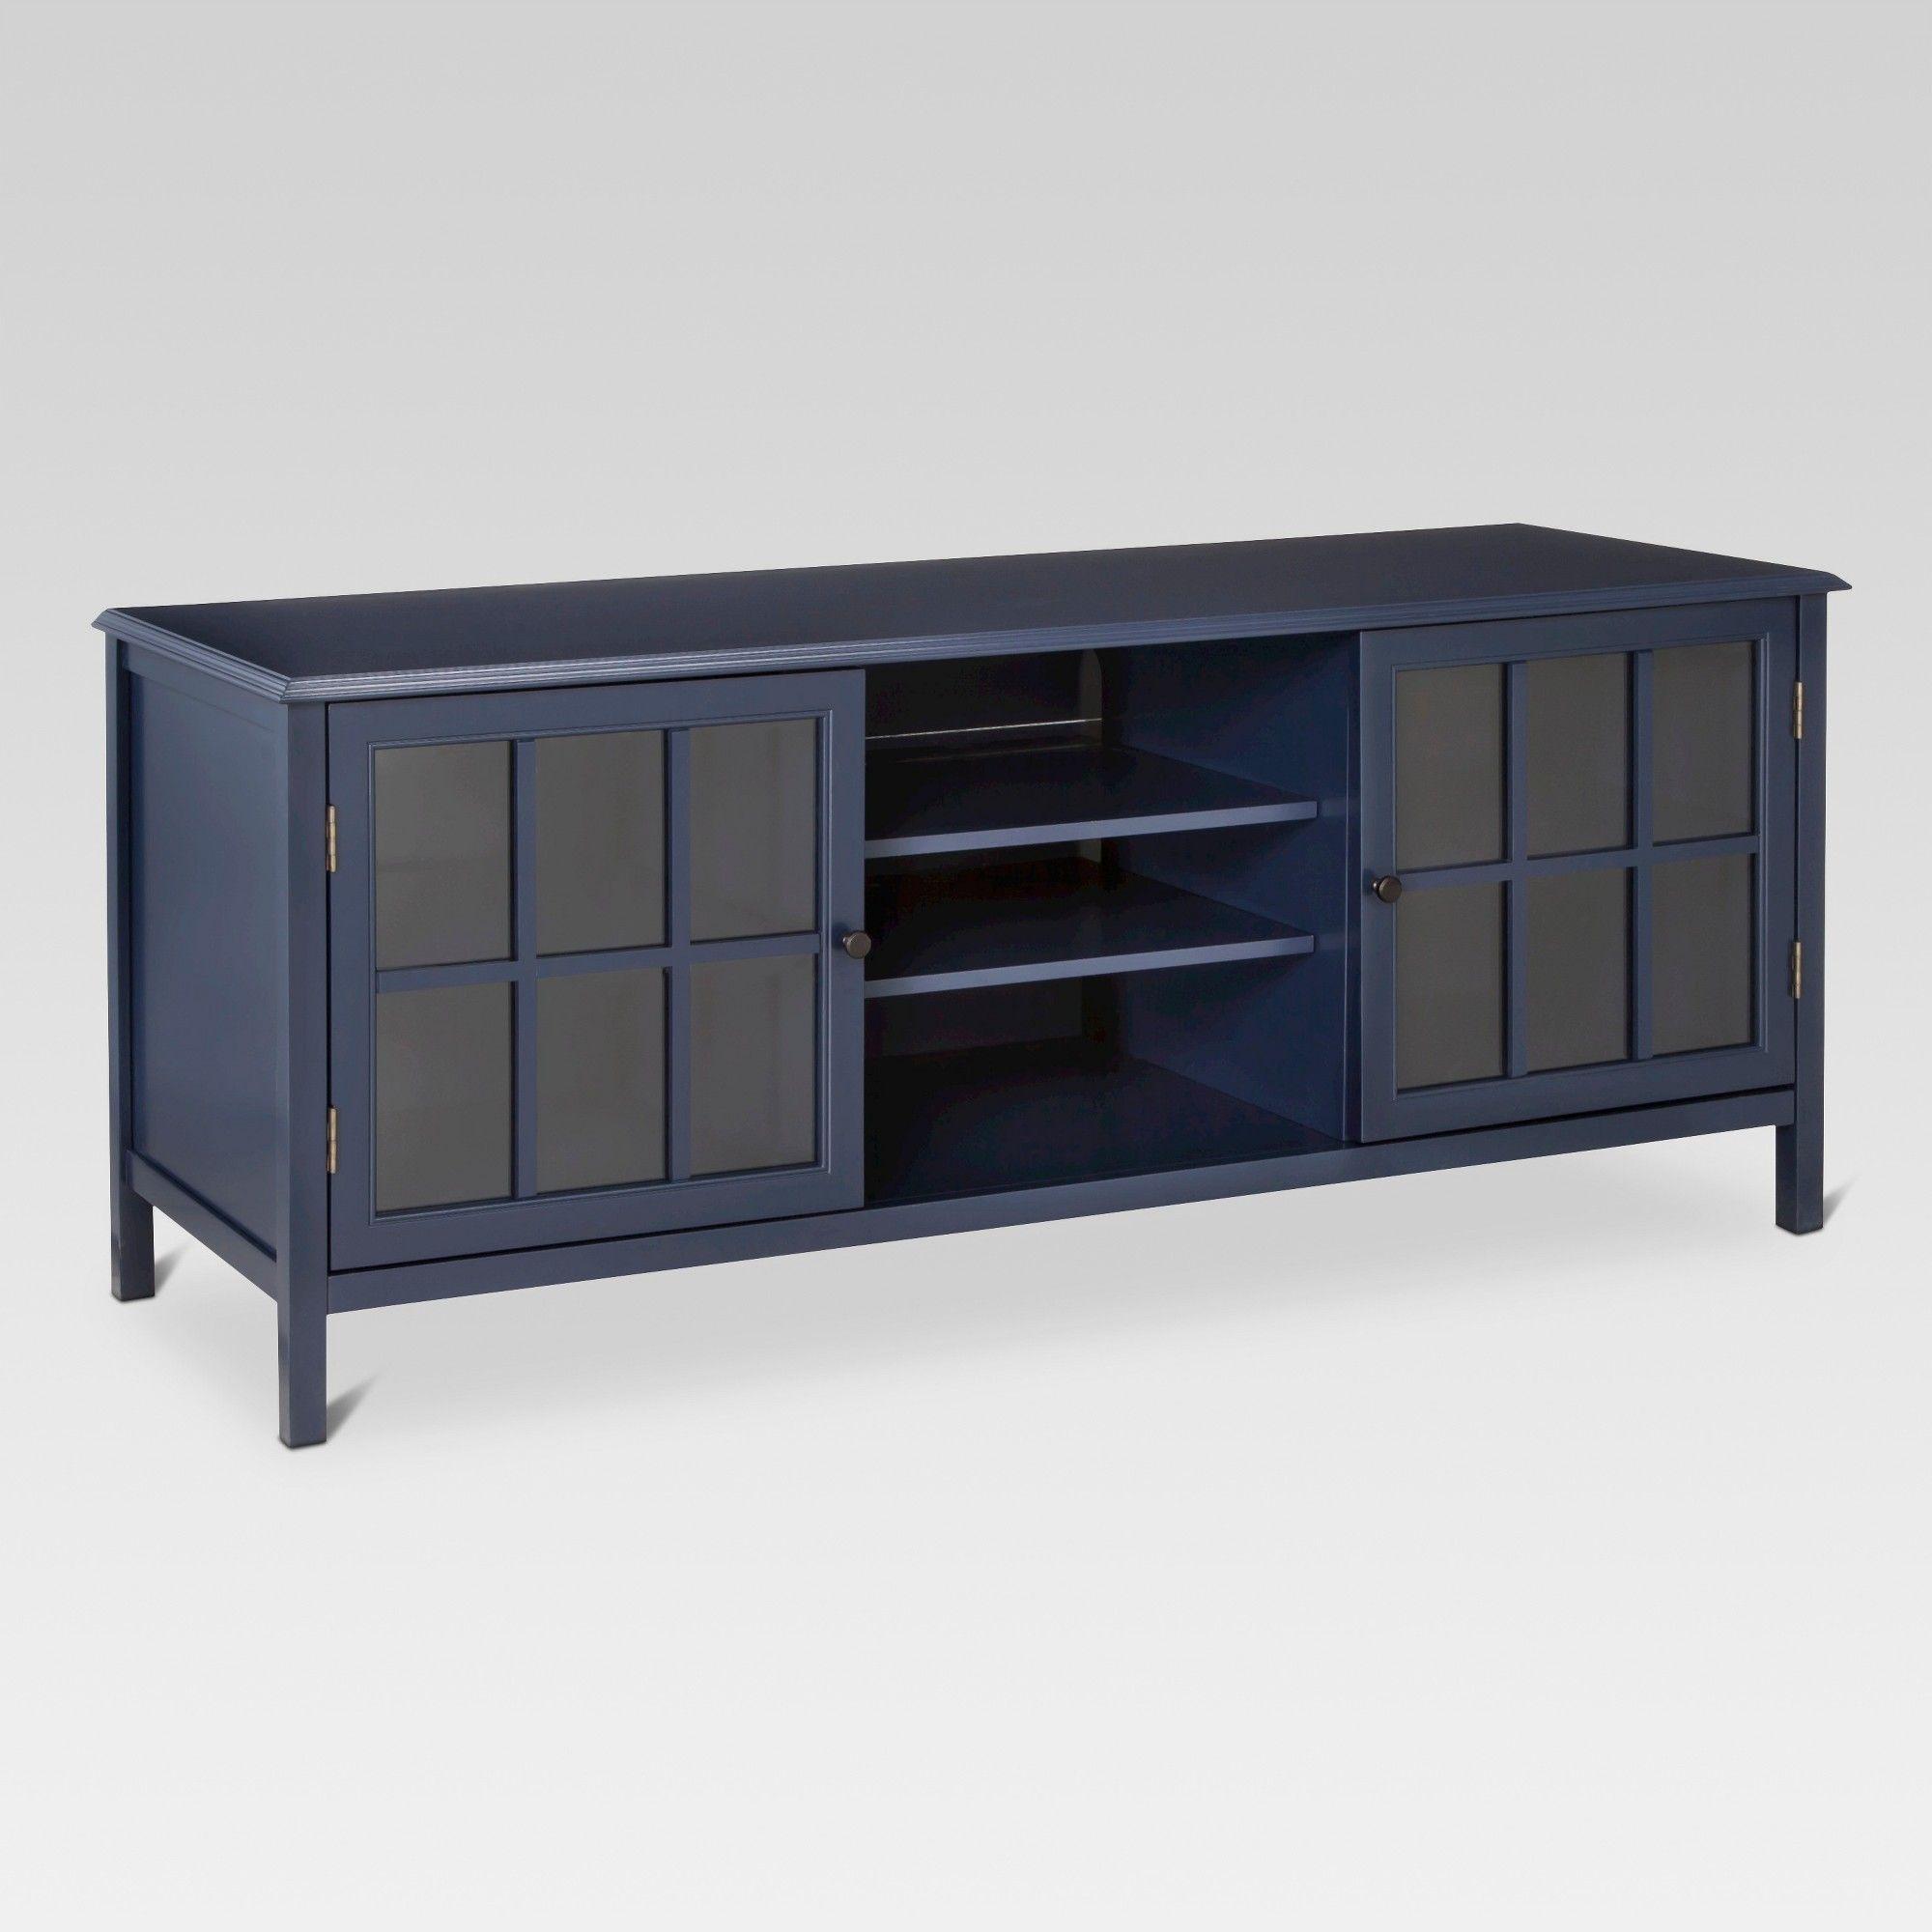 Haus vorderseite seitenwand design windham large tv stand   threshold blue in   products